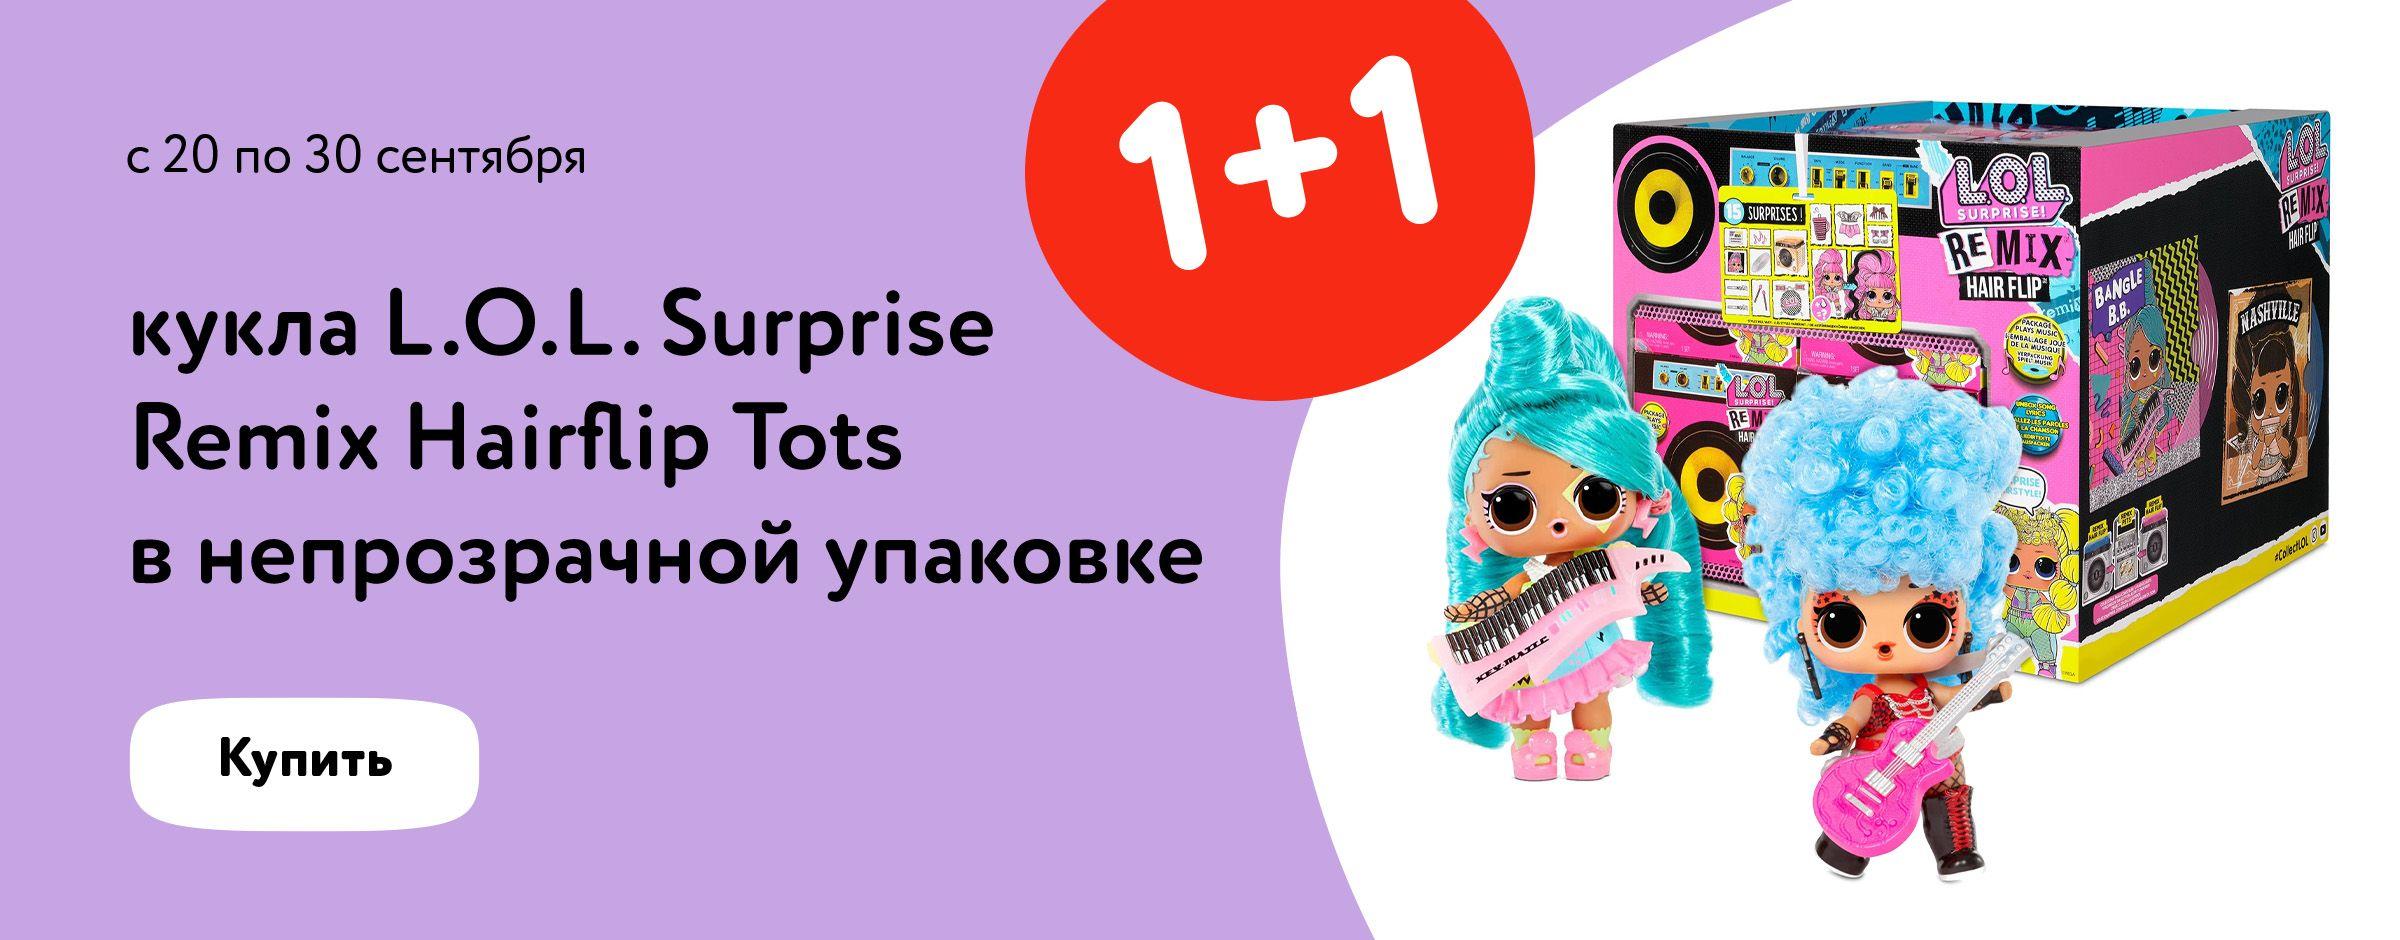 1+1 на куклу L.O.L. Surprise! Remix Hairflip Tots статика + категории